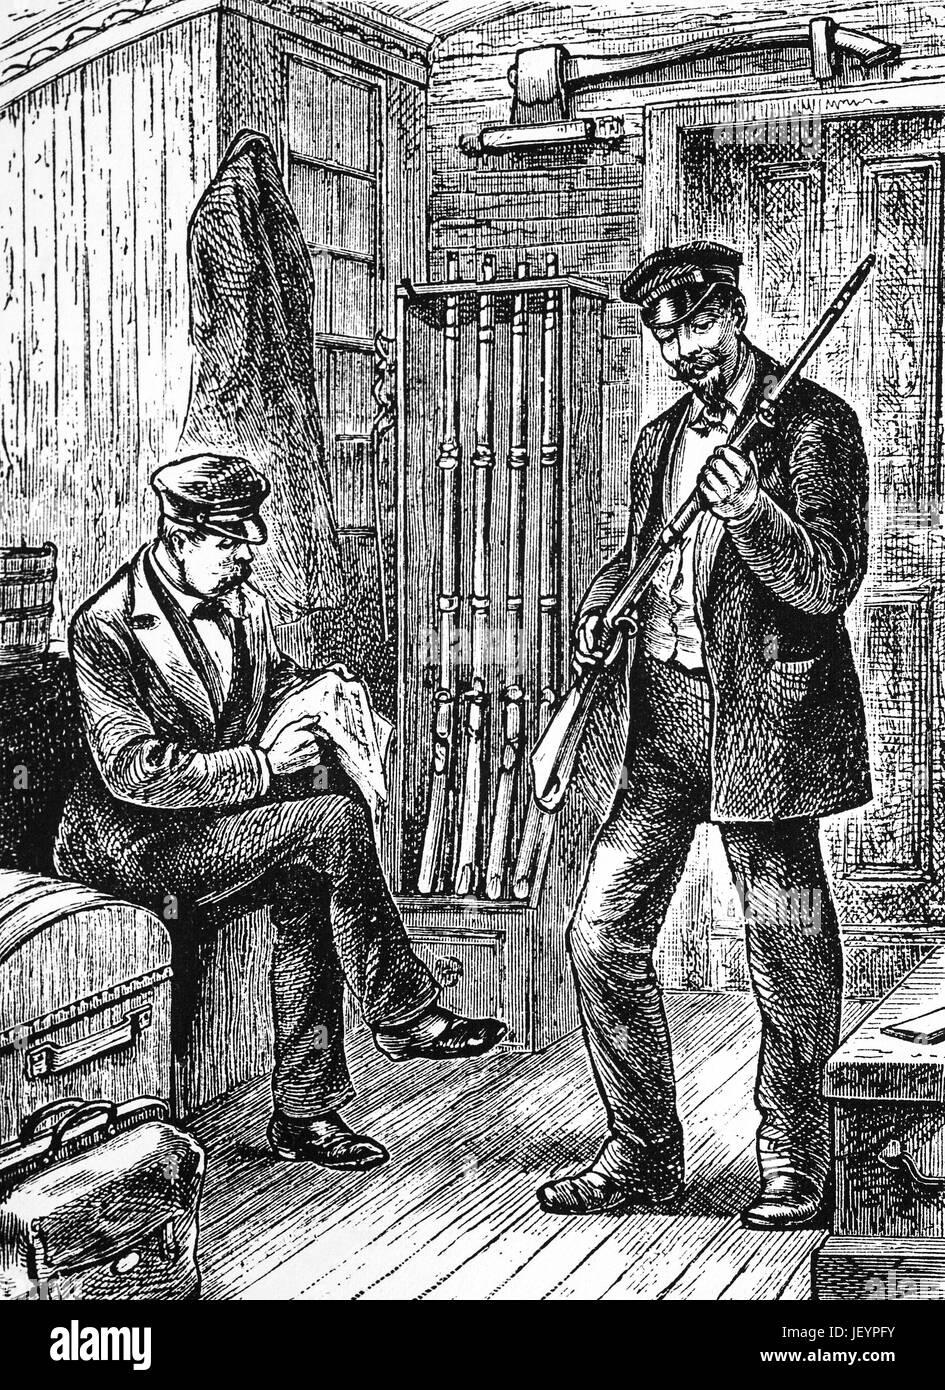 1879: The baggage master's armoury on the train to Atlanta, Georgia, United States of America - Stock Image